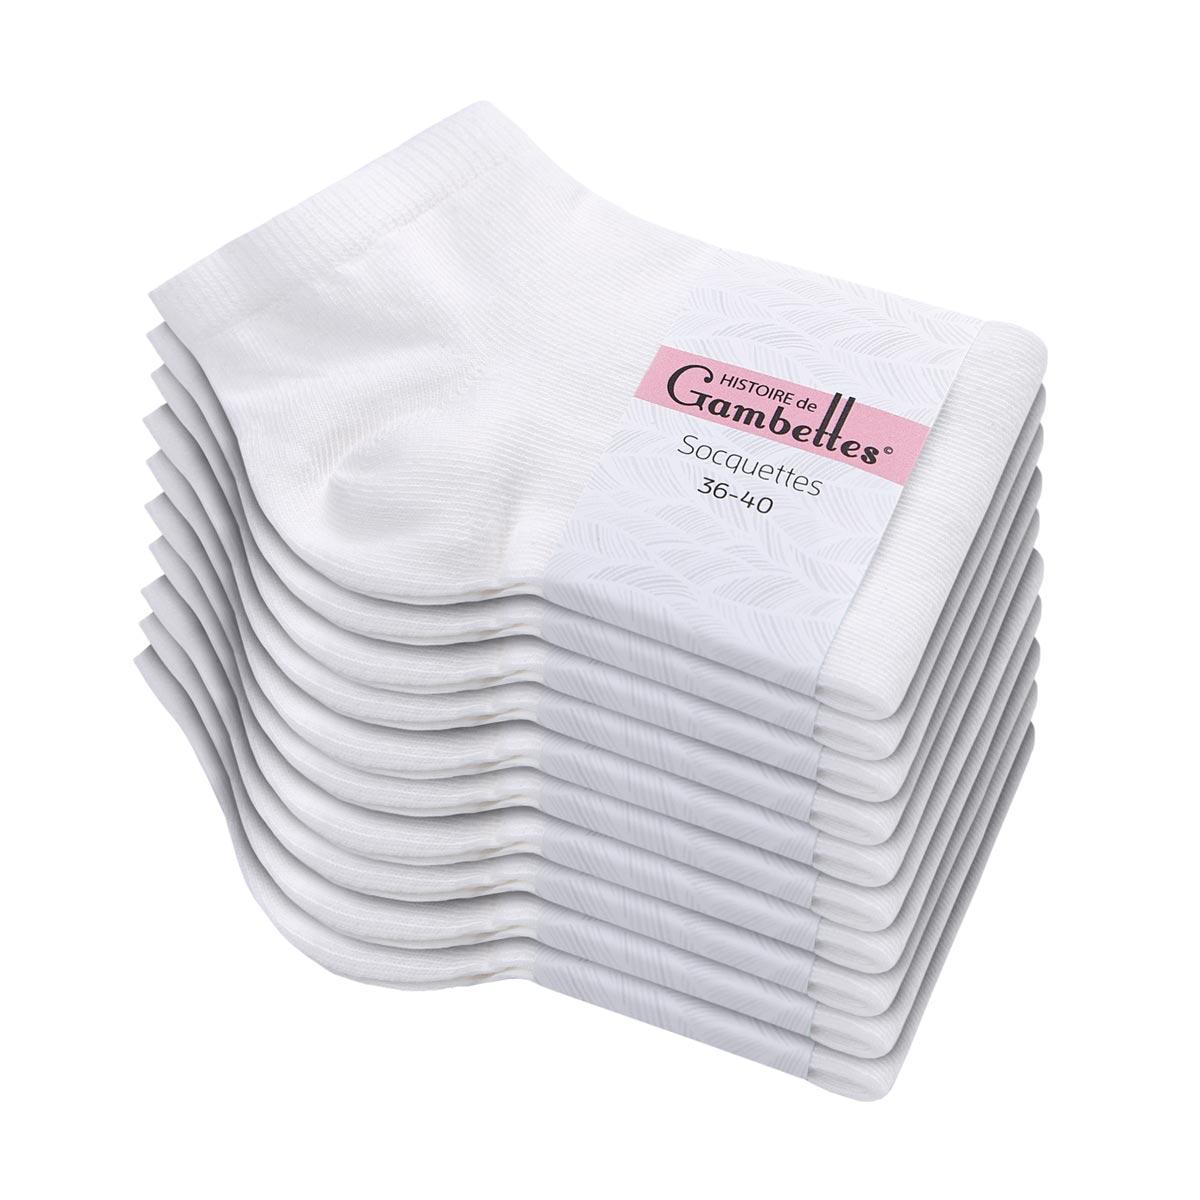 CH-00535_E12-1--_Soquettes-femme-blanches-lot-10-paires